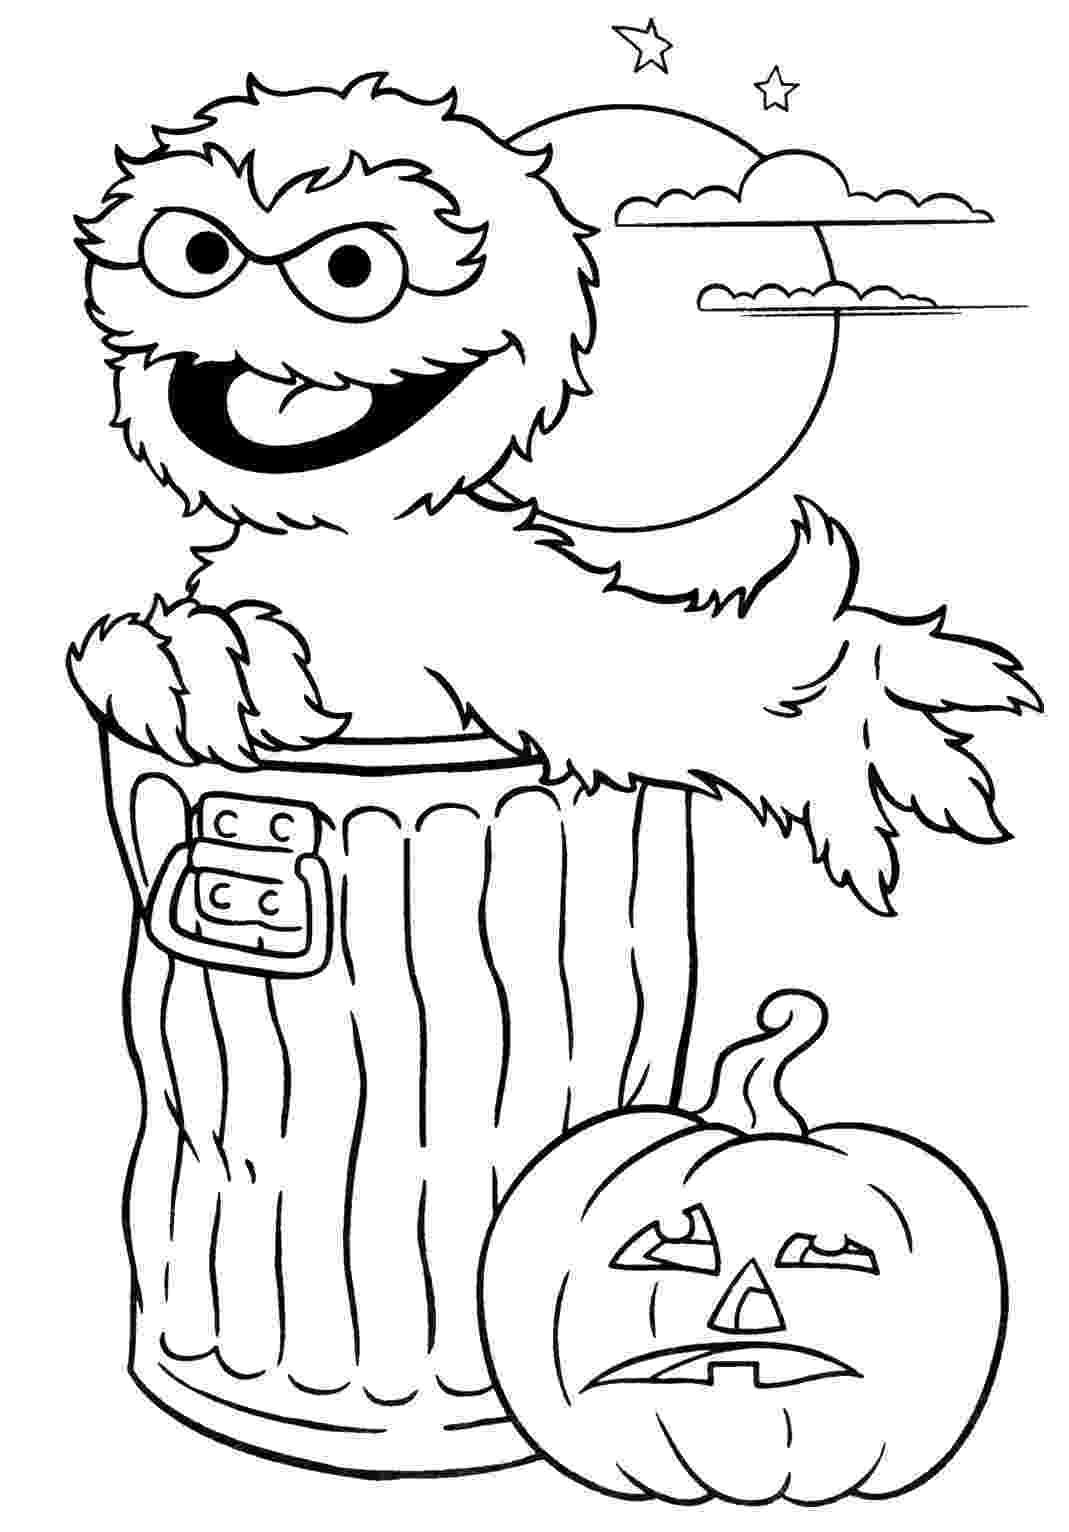 printable colouring halloween cards halloween bingo no3 coloring page crayolacom halloween cards printable colouring